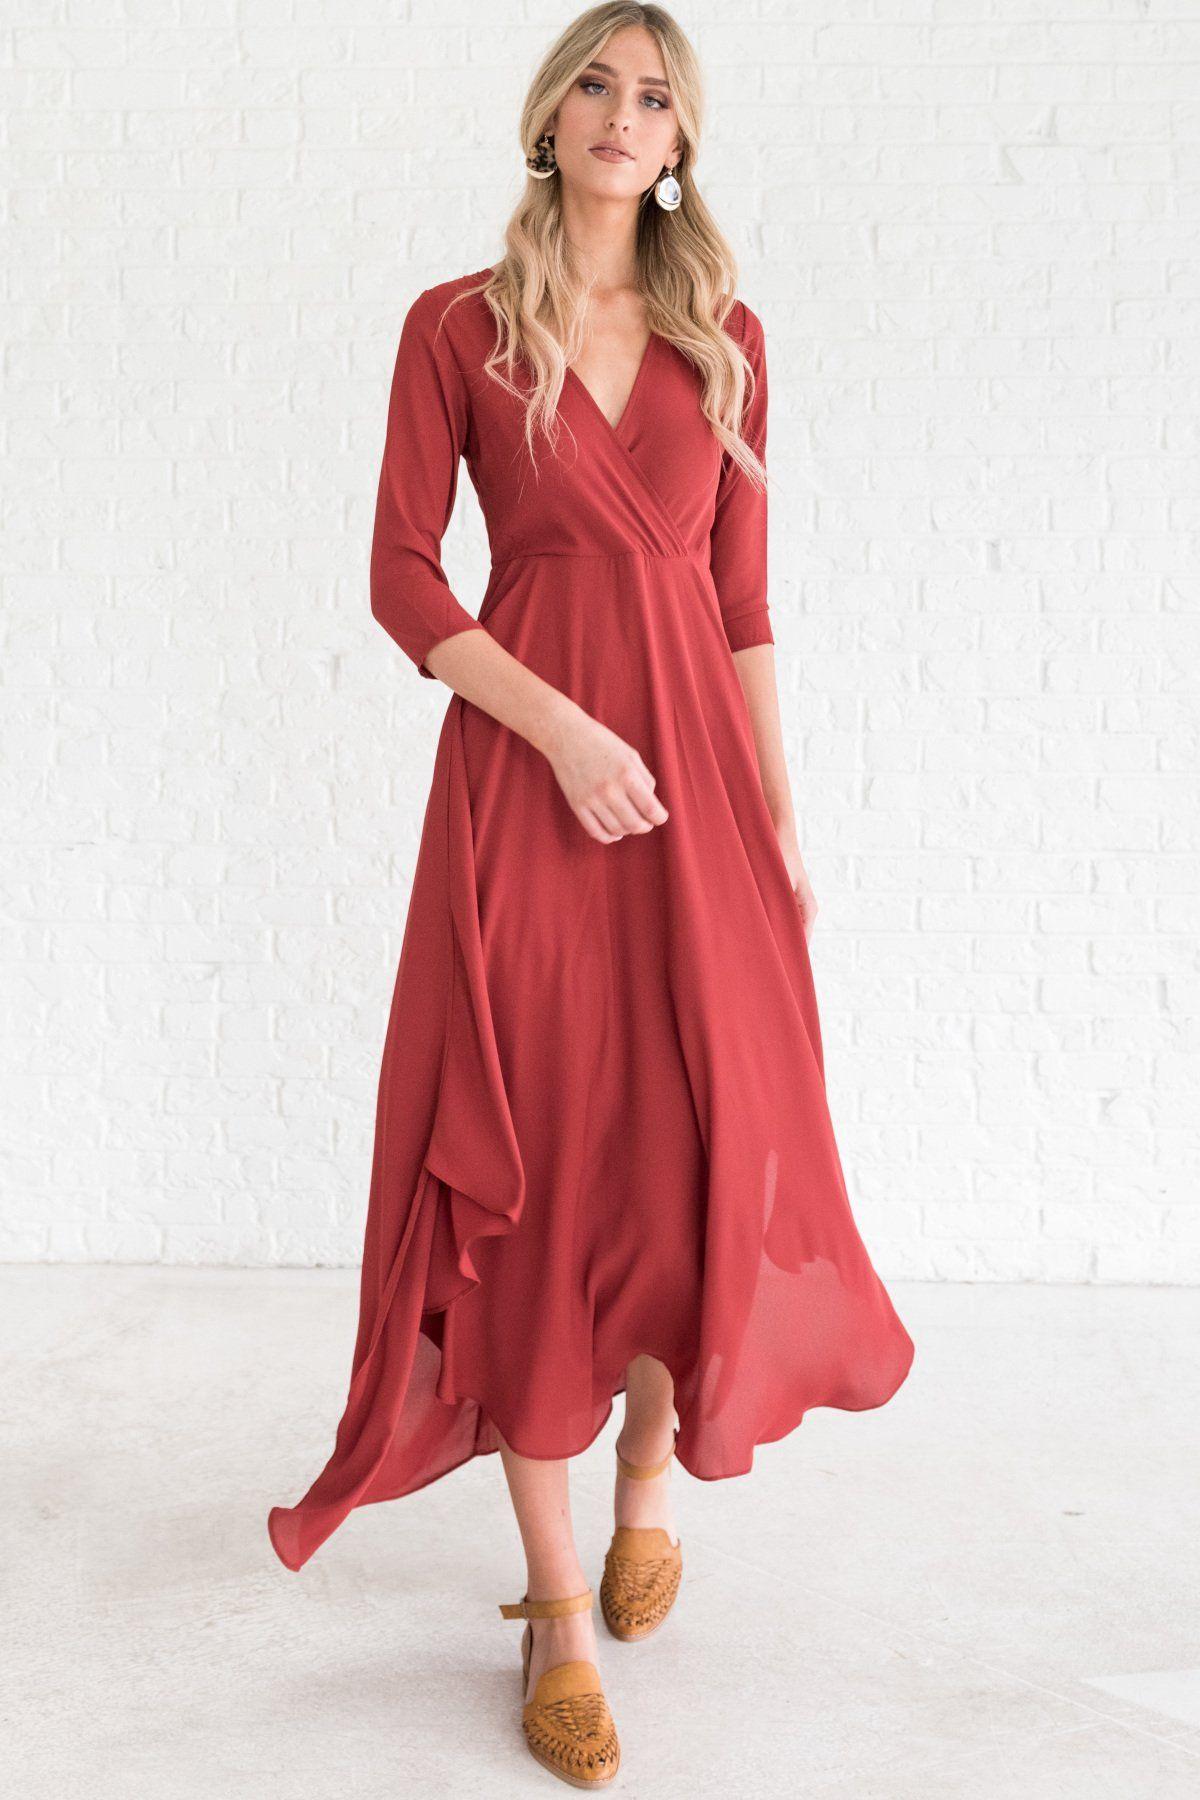 21+ Orange wedding dress to buy ideas in 2021